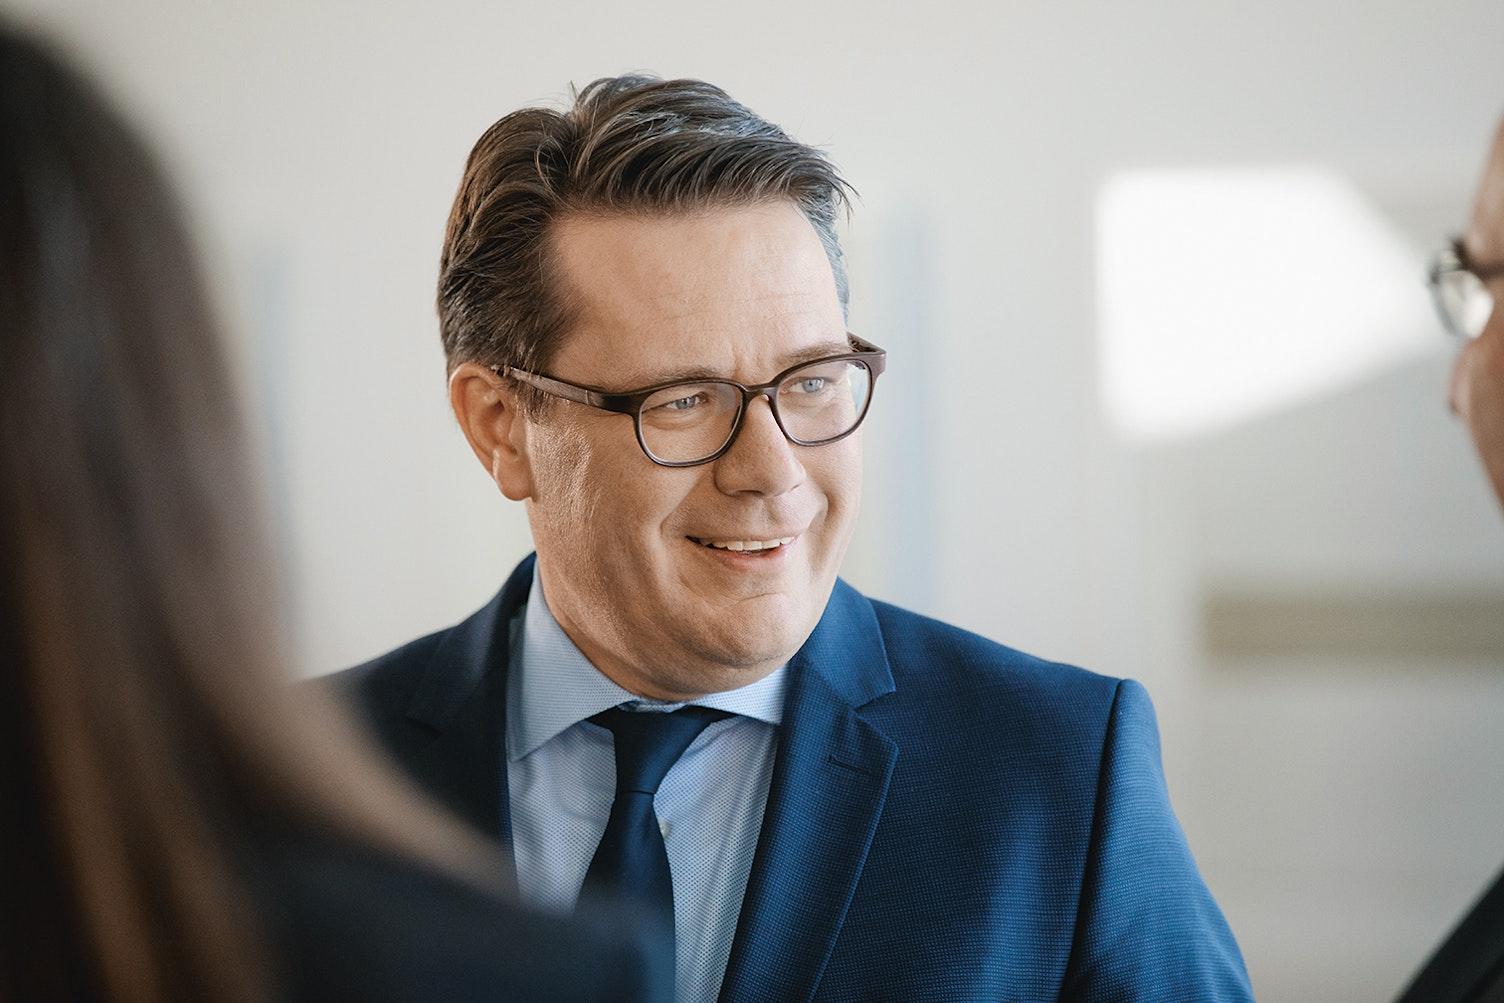 Benedikt Würth